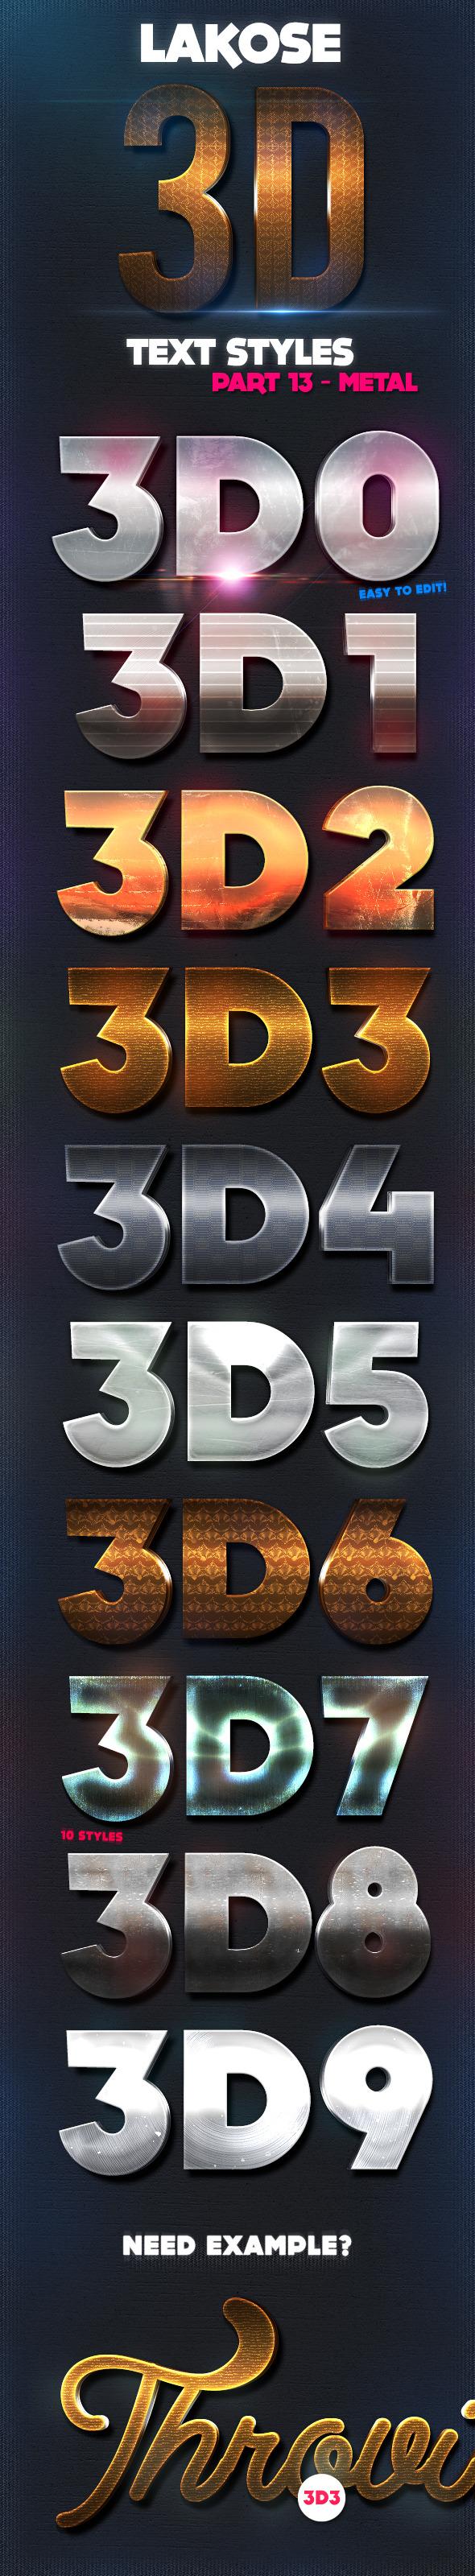 Lakose 3D Text Styles Part 13 - Text Effects Styles